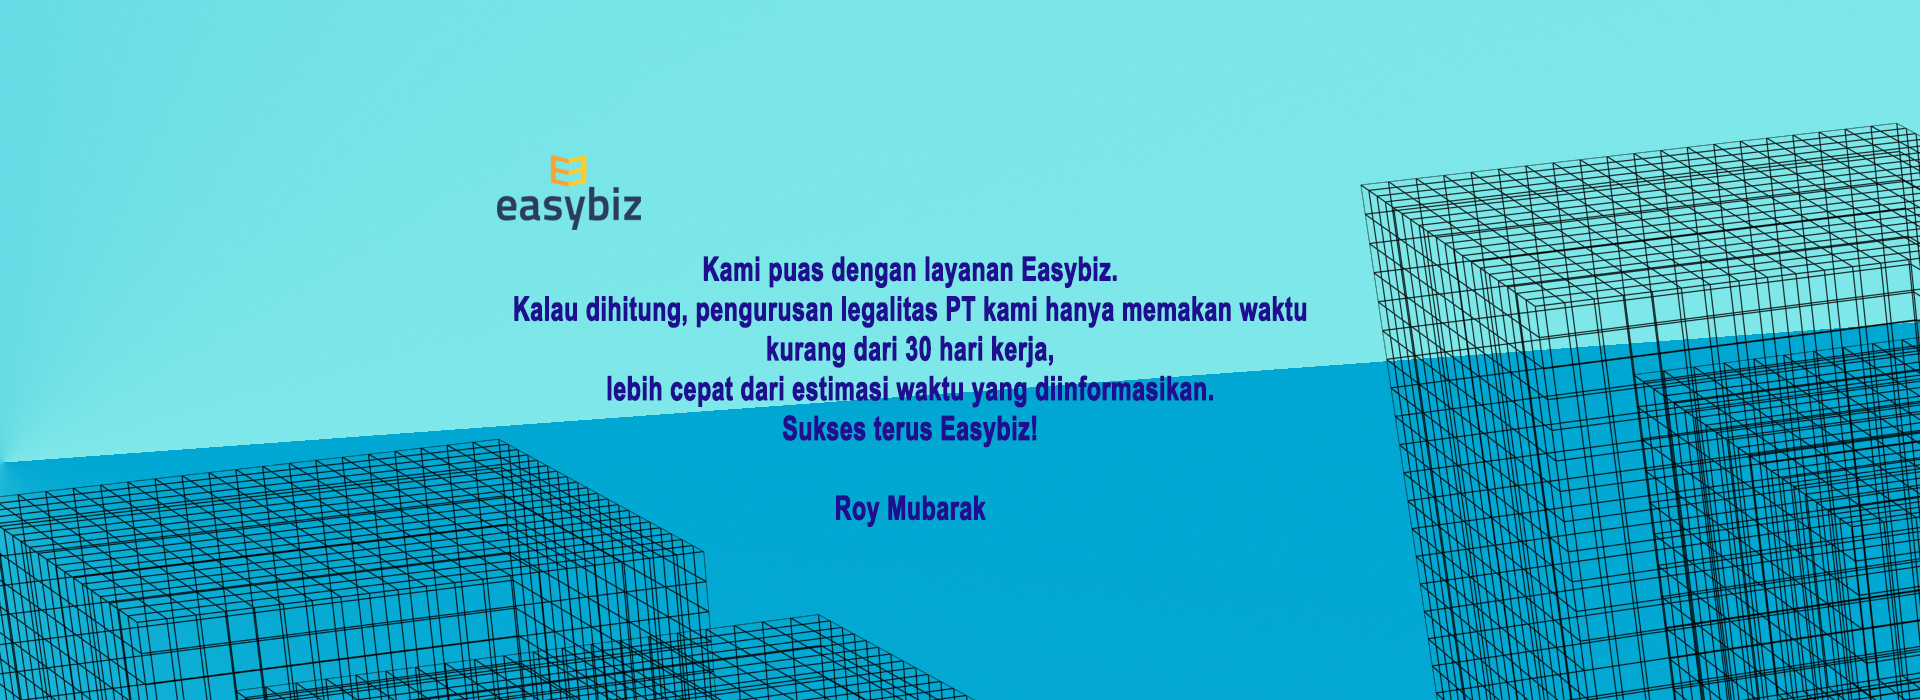 Easybiz-testi Pak Roy